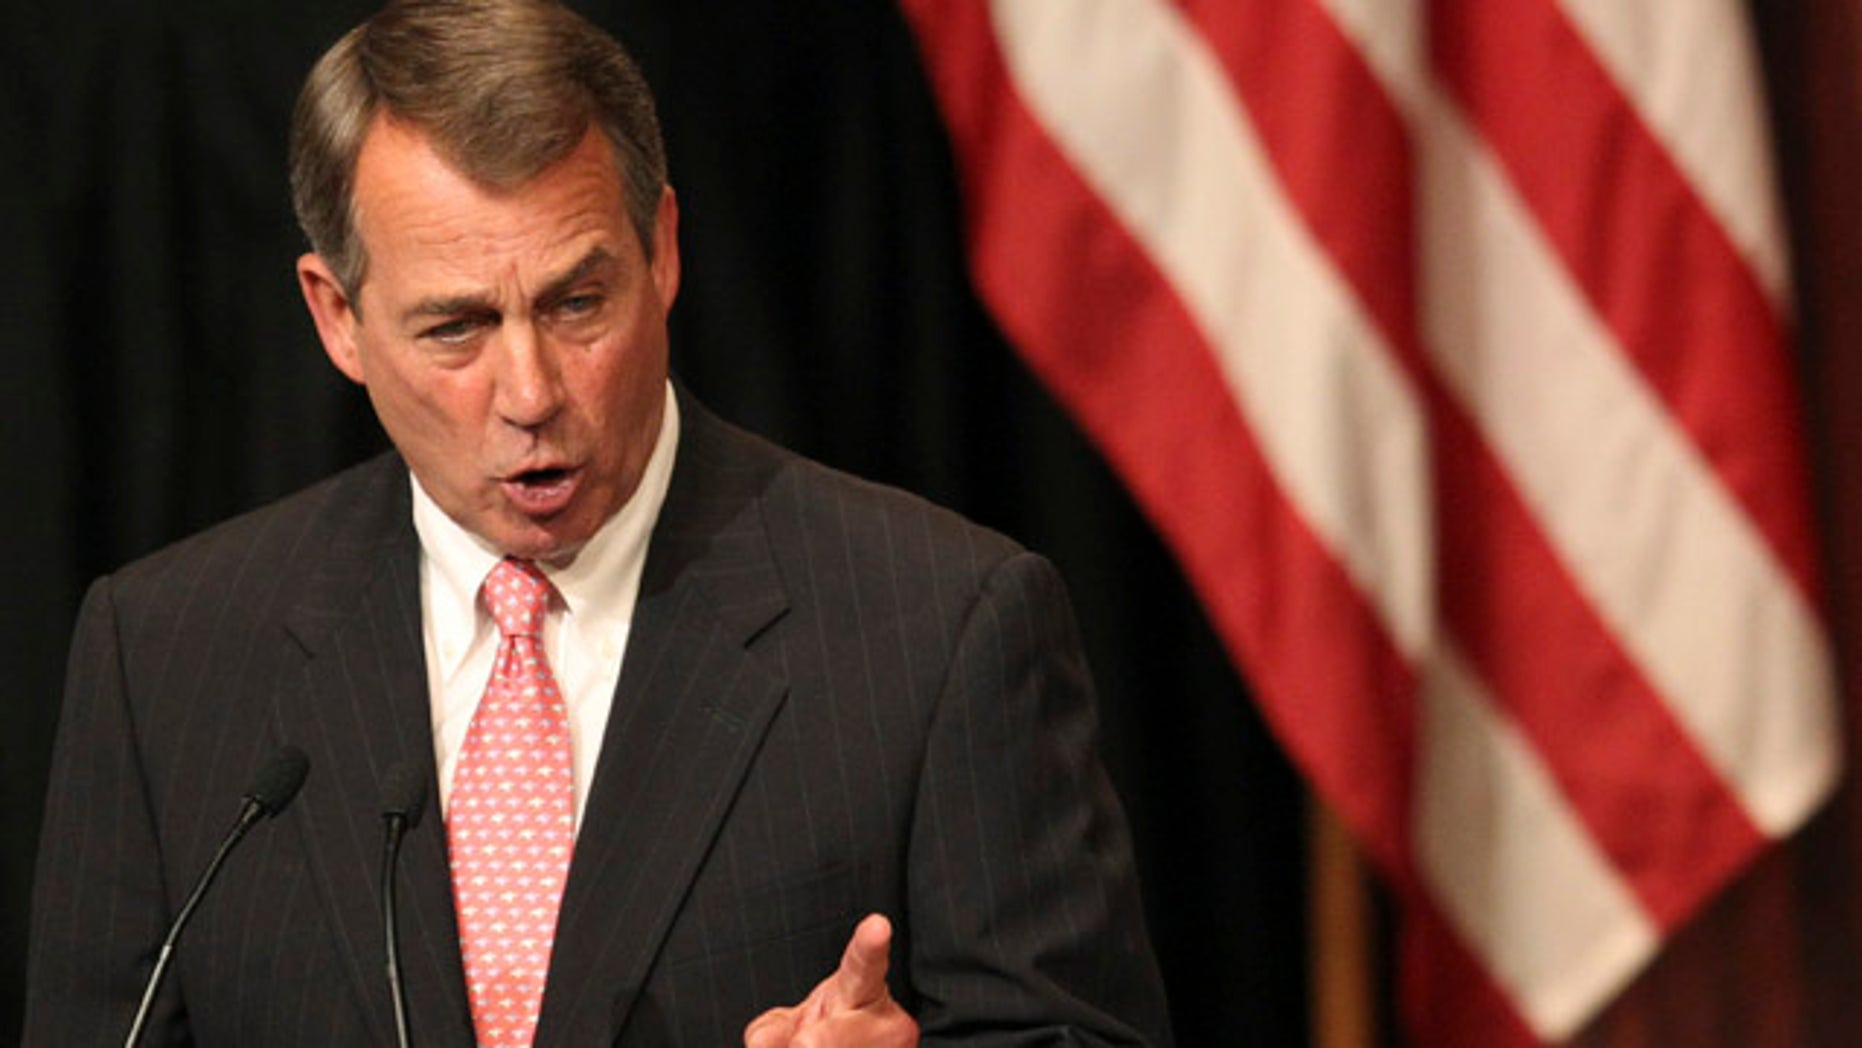 May 9: U.S. House Speaker John Boehner gestures as he addresses the Economic Club of New York